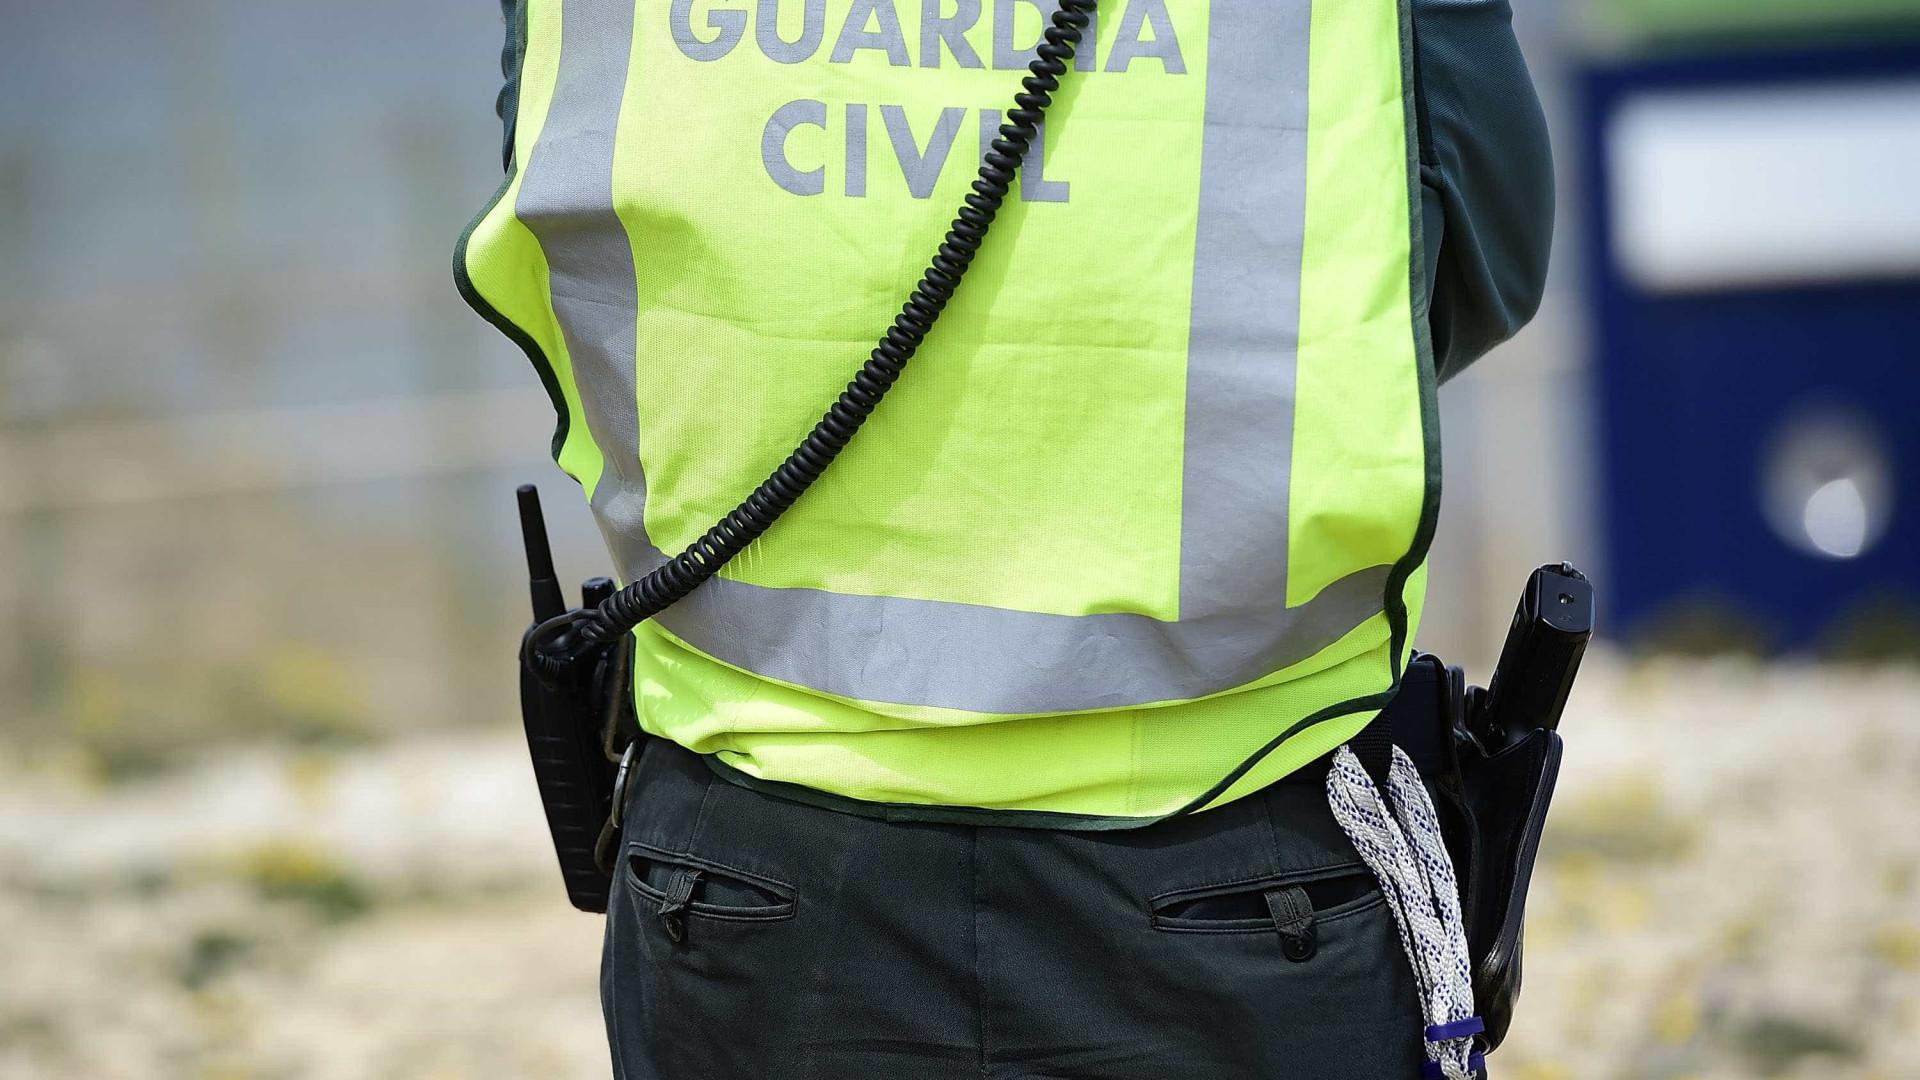 Condutor detido na Galiza após teste dar positivo para todas as drogas